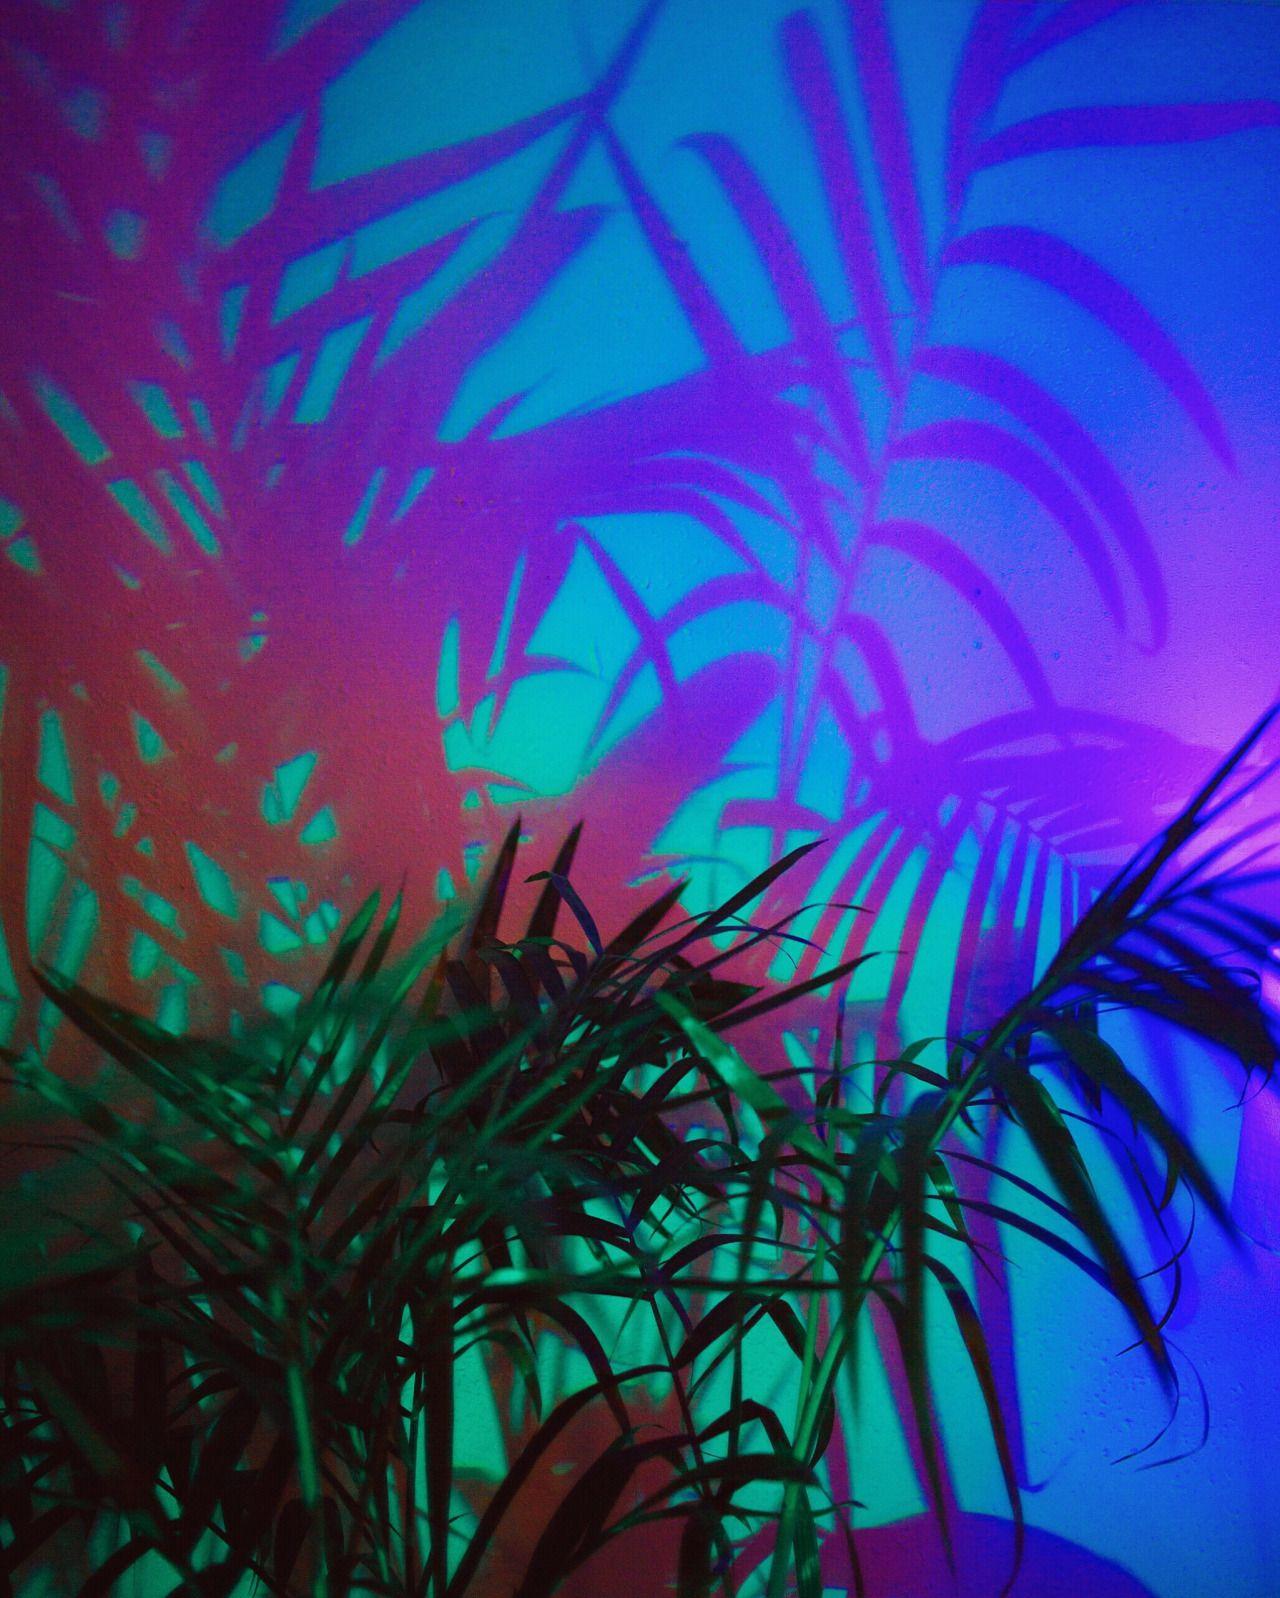 Neon Blue Aesthetic App Icons